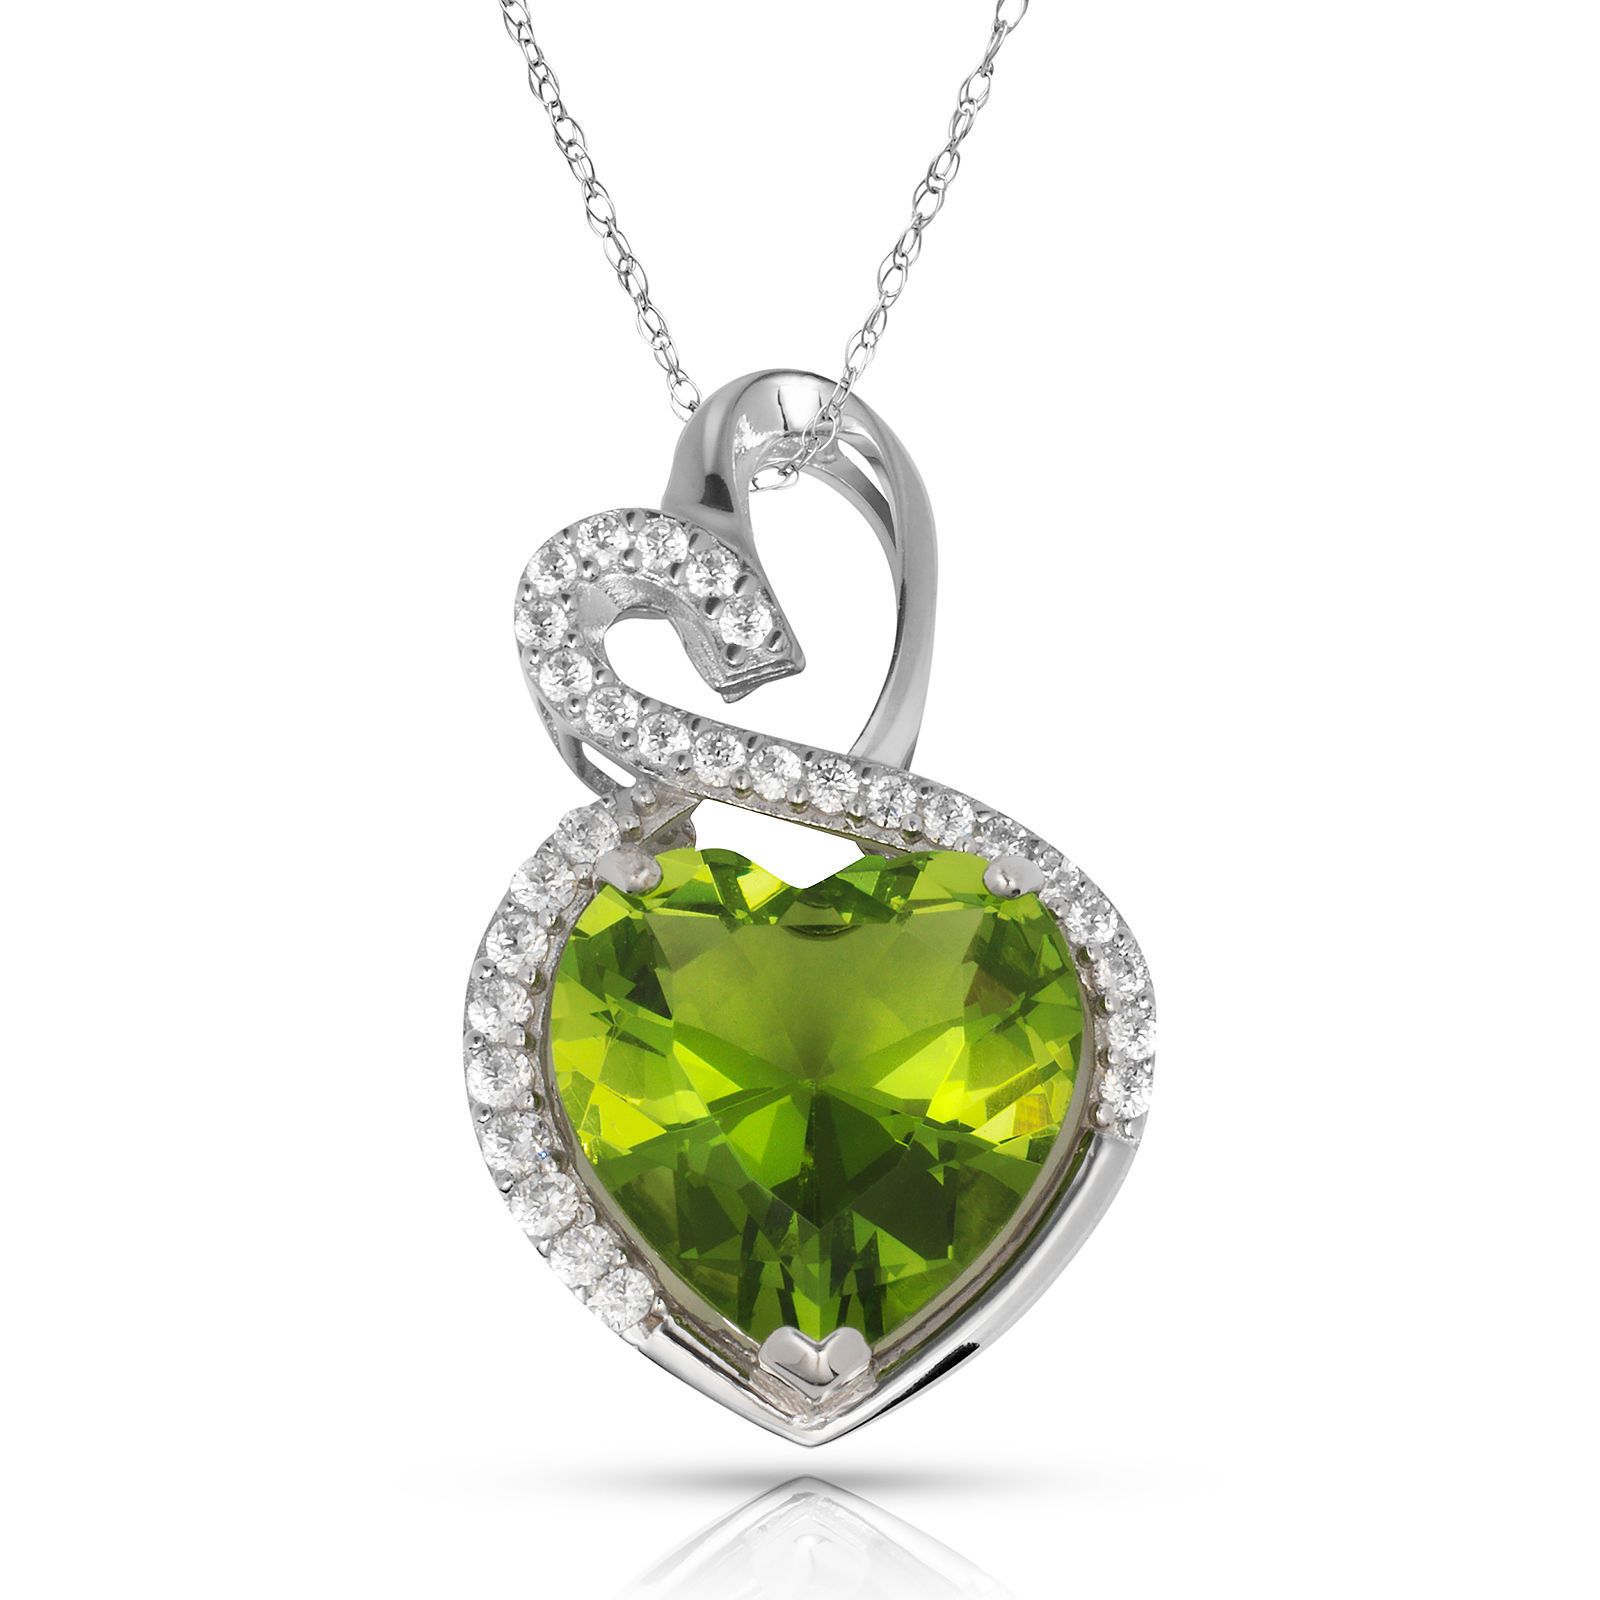 4.20 Carat Halo Peridot Double Heart Gemstone Pendant & Necklace14K White Gold